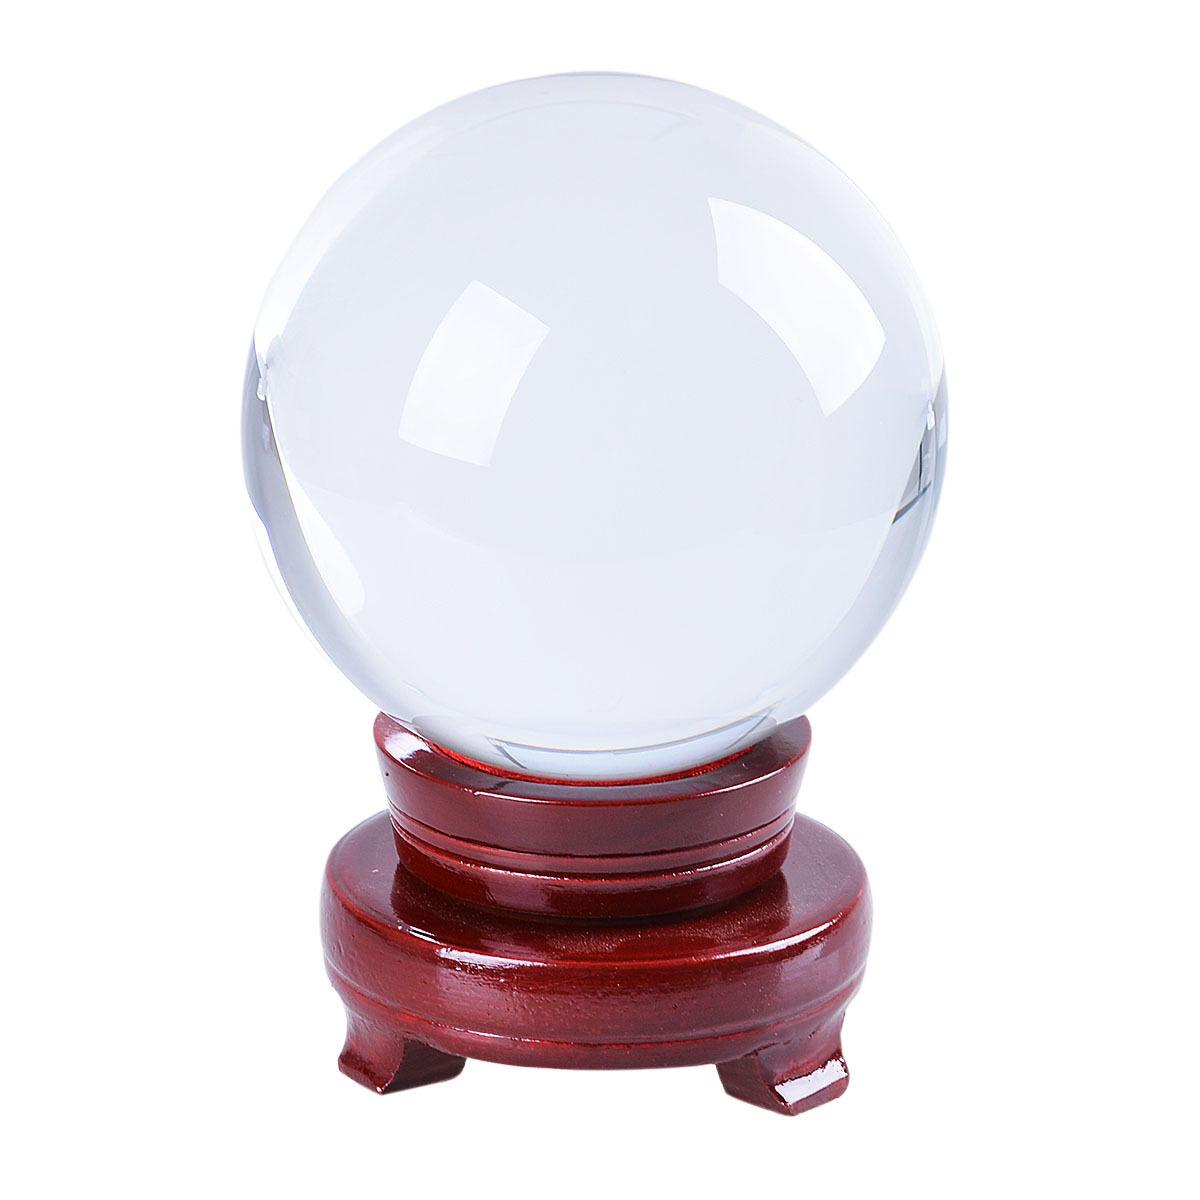 Longwin 120mm Big Clear Quartz Crystal Ball Sphere Photo